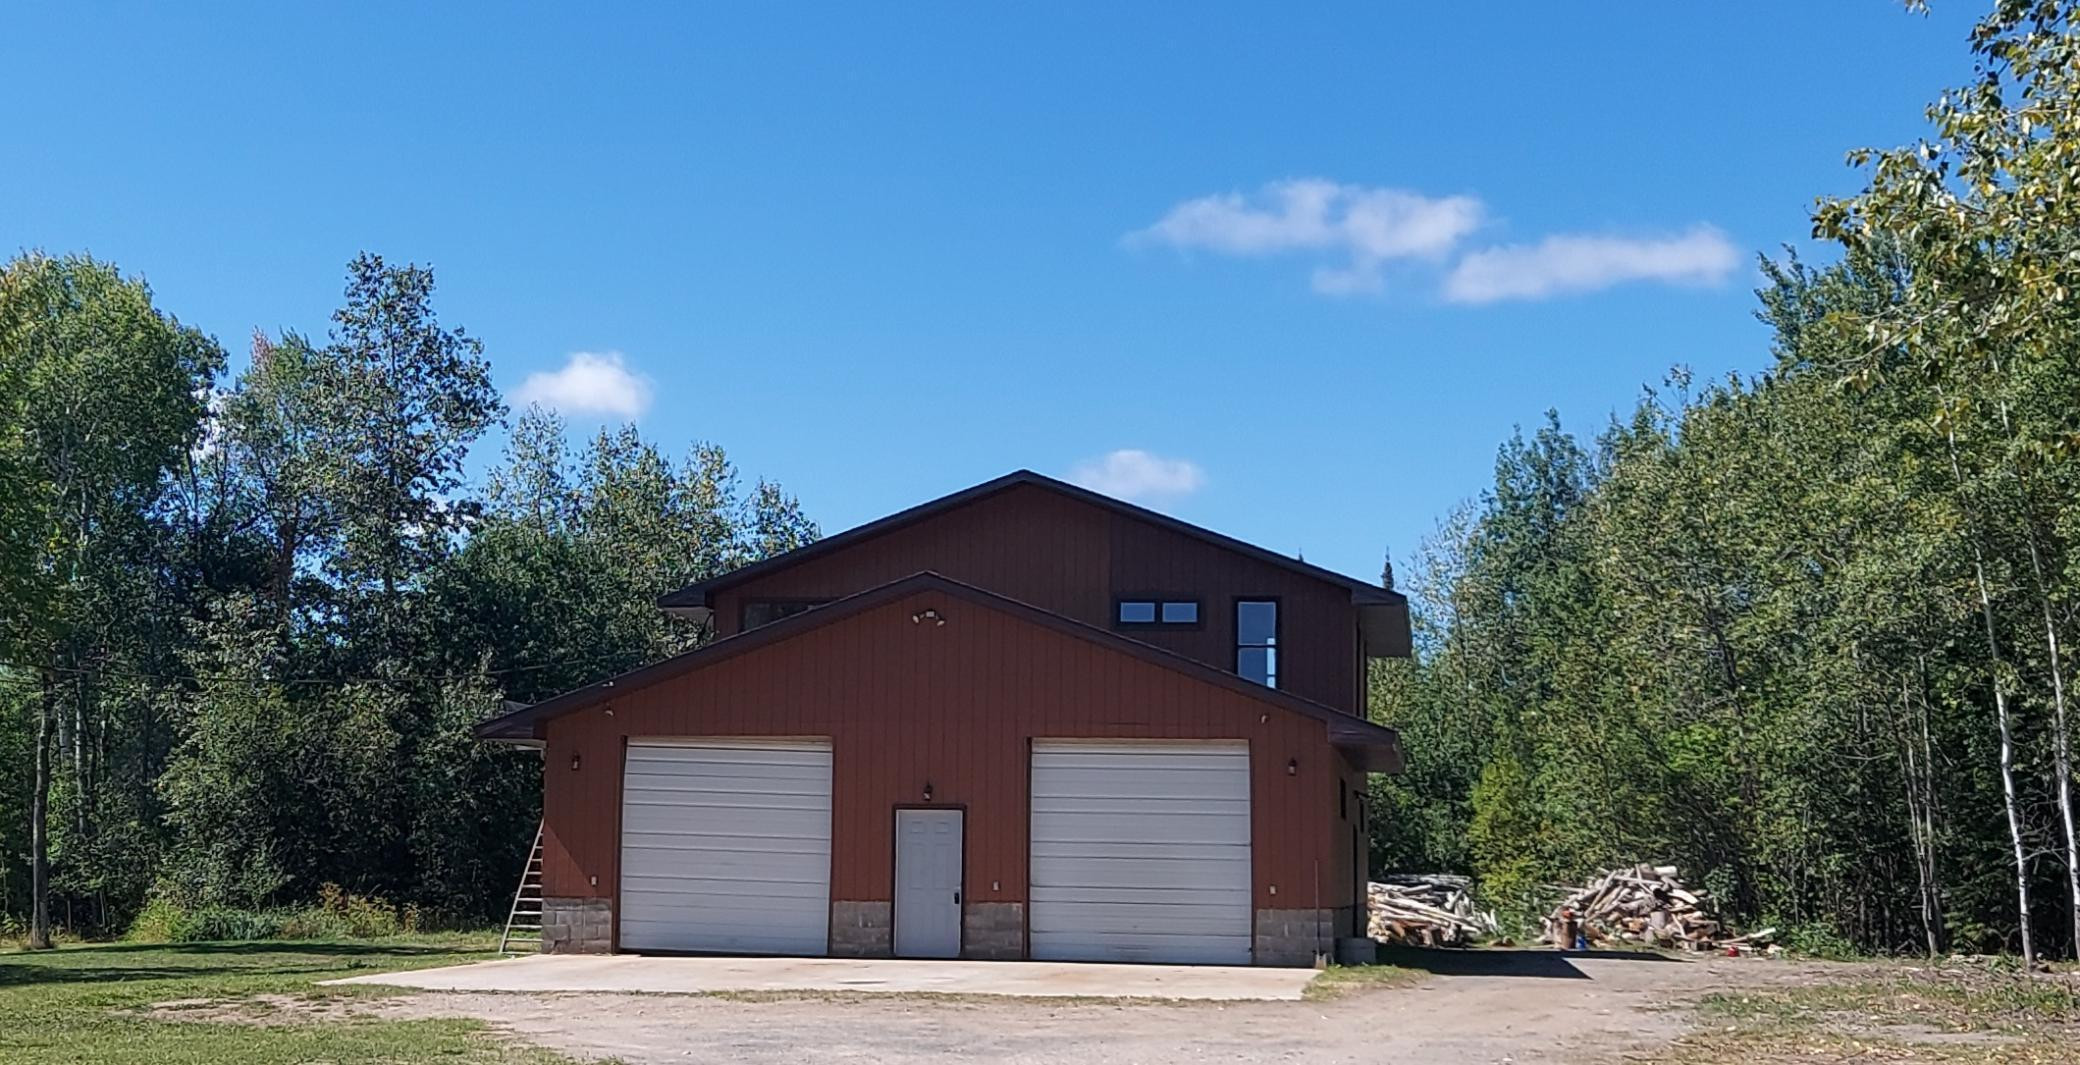 2956 County Road 2 N, International Falls, MN 56649